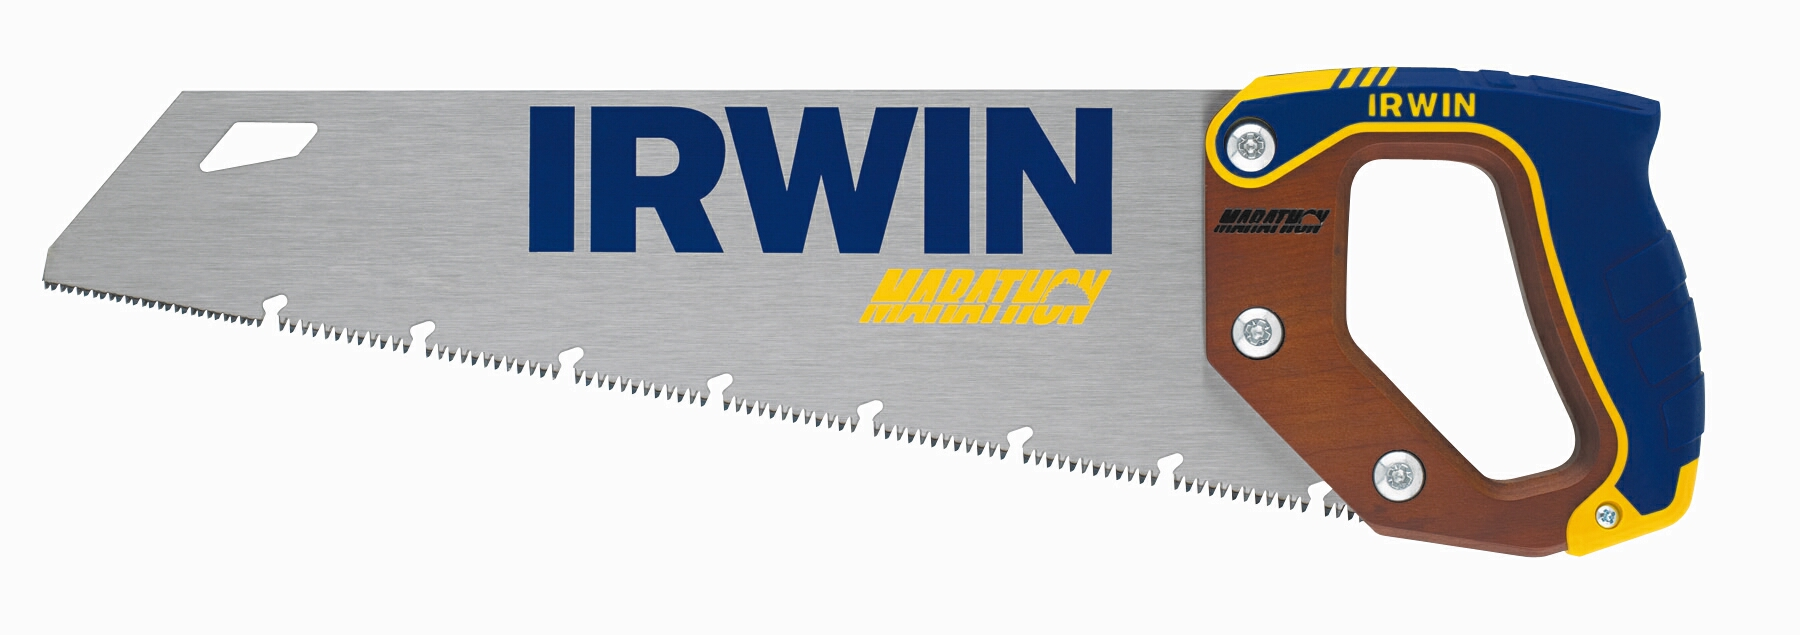 IRWIN MARATHON Carpenter Saw - Irwin Tools Logo PNG